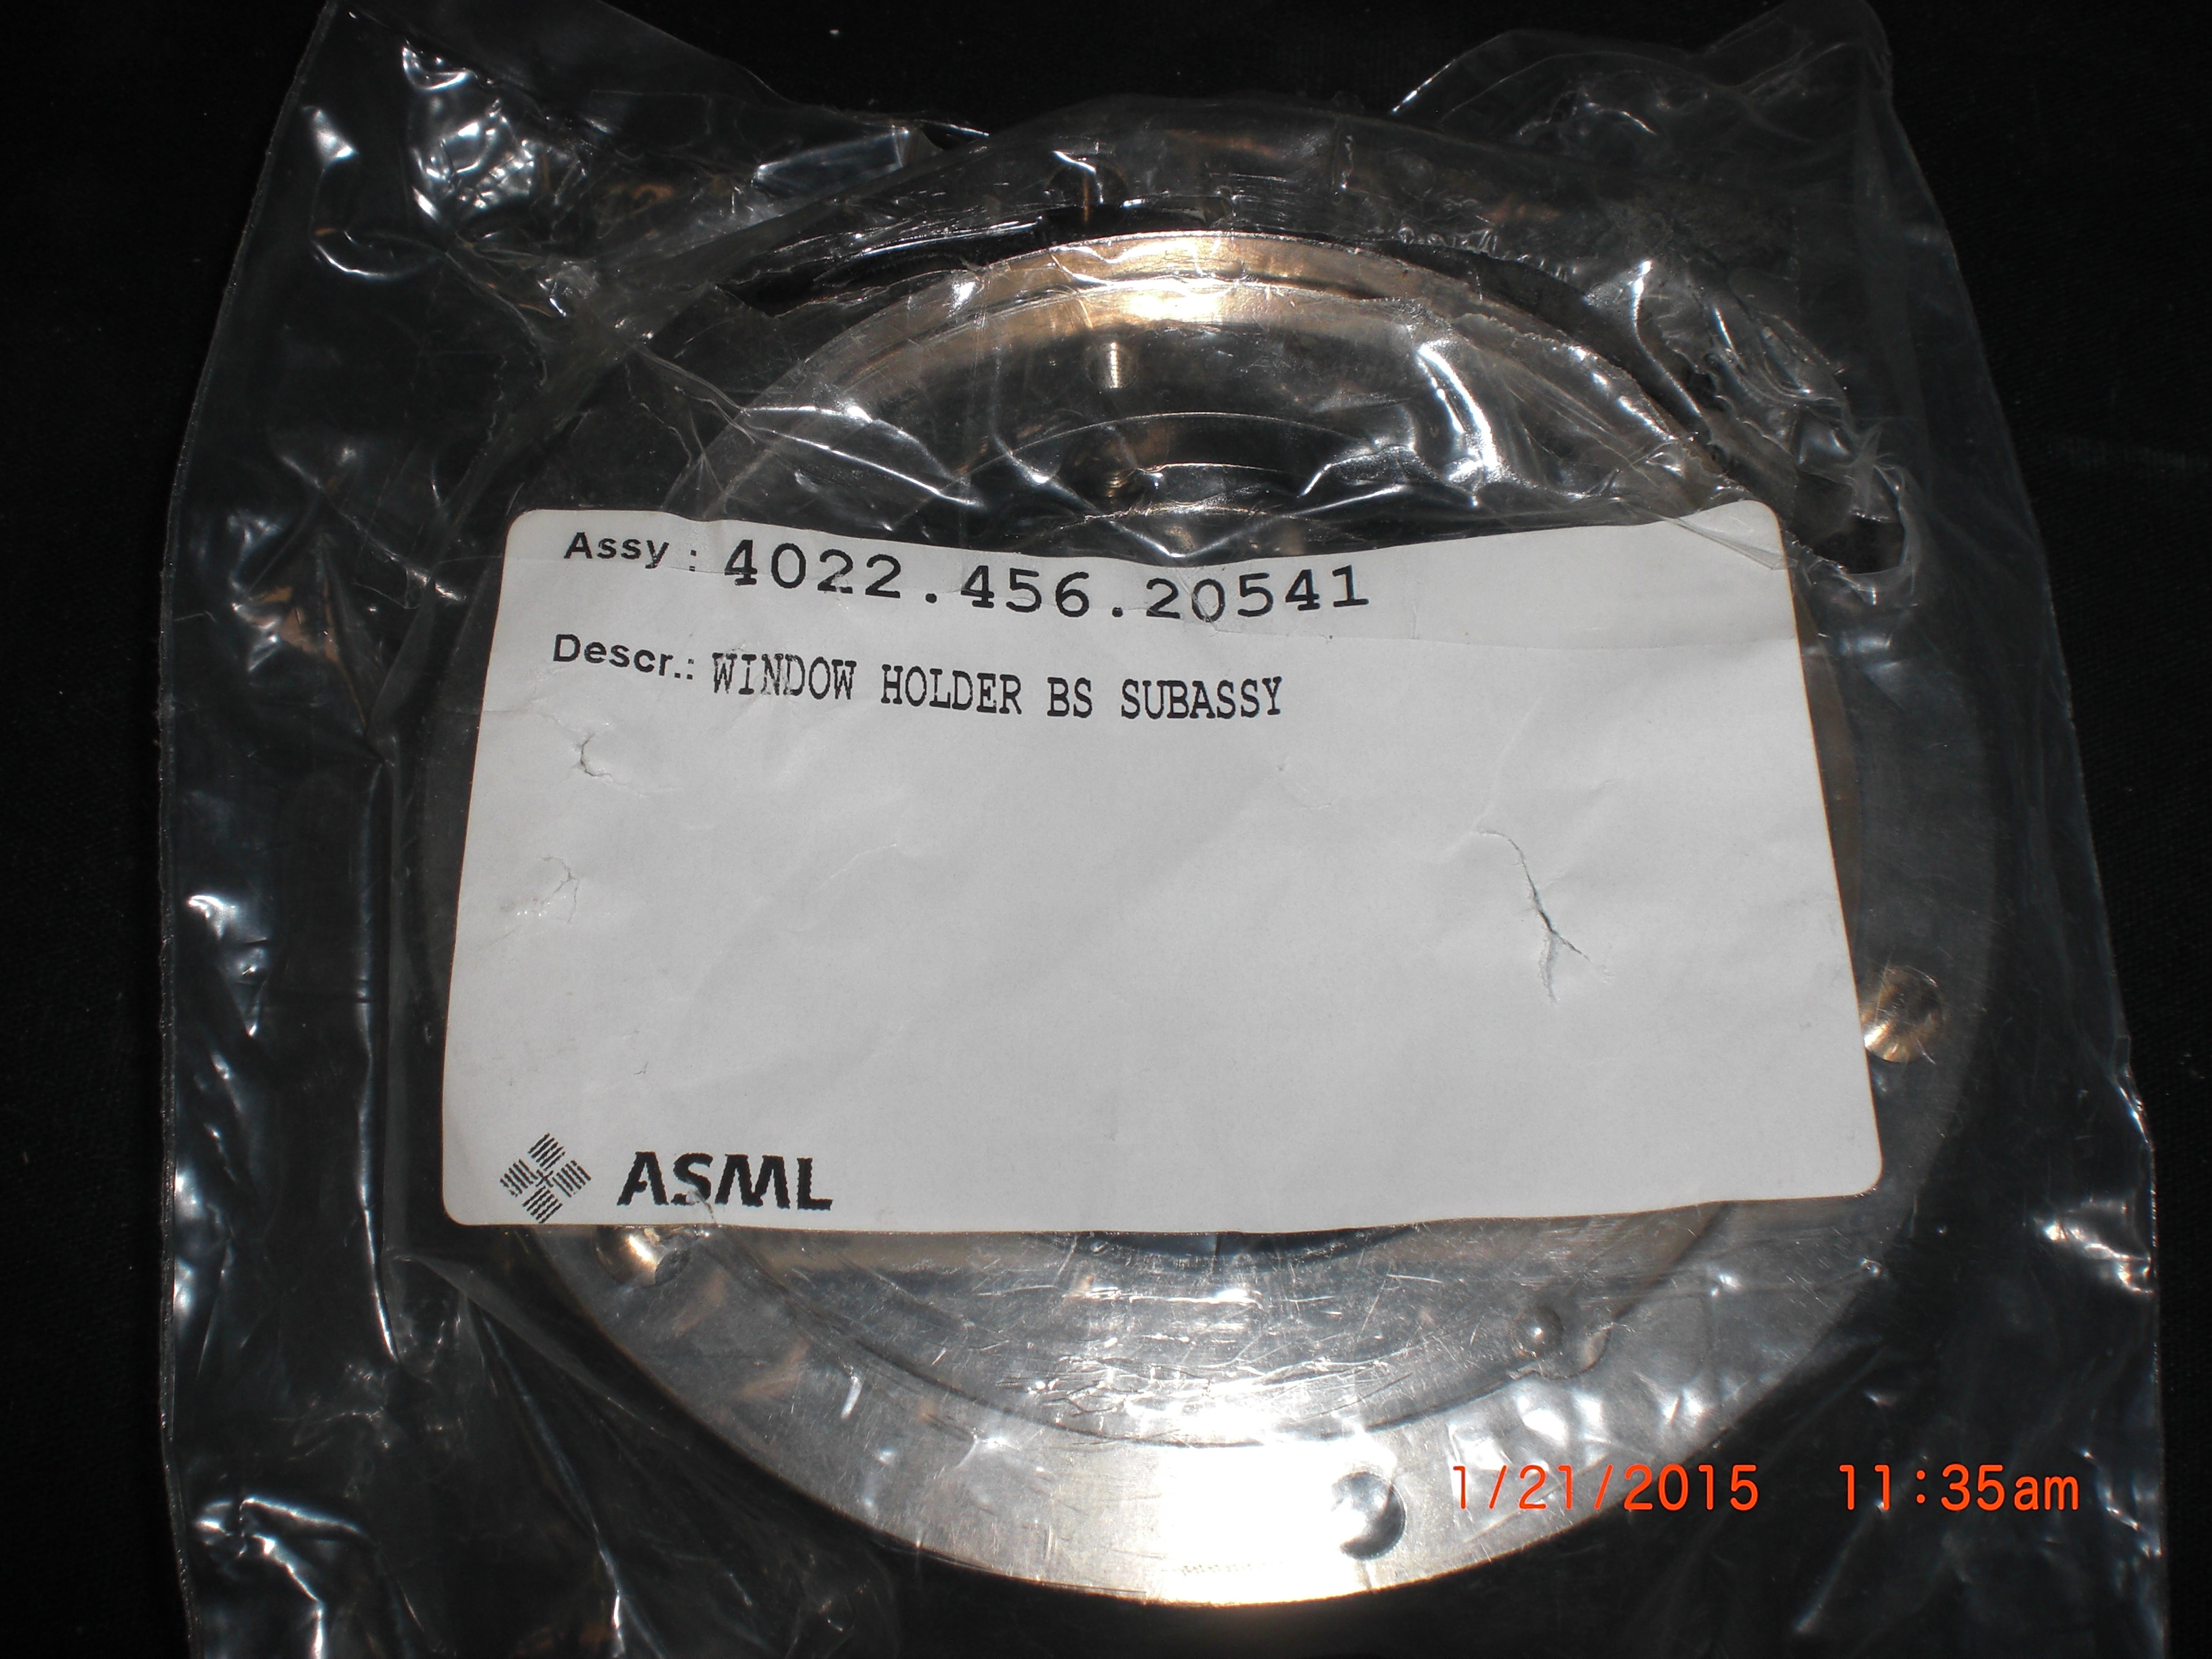 Lens  ASML SERV.456.20541 Window Holder BS SUB-ASSY